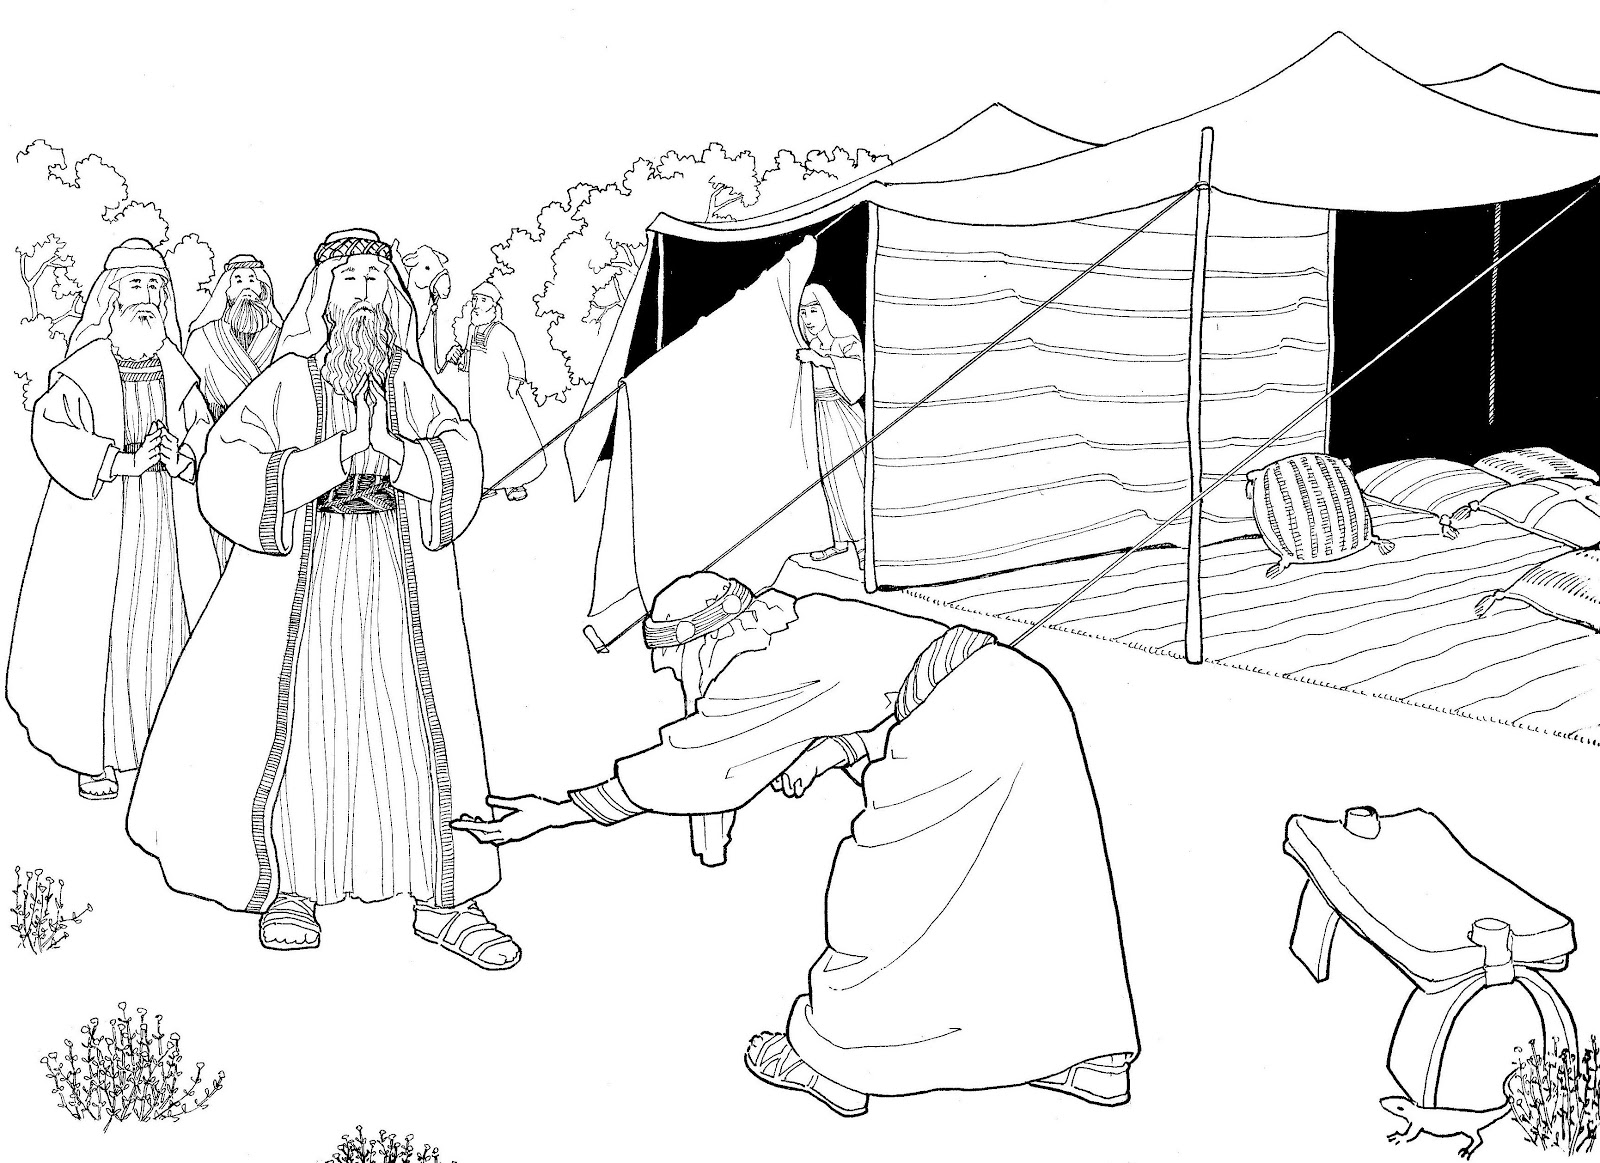 Make a joyful color: Abraham greets his heavenly visitors